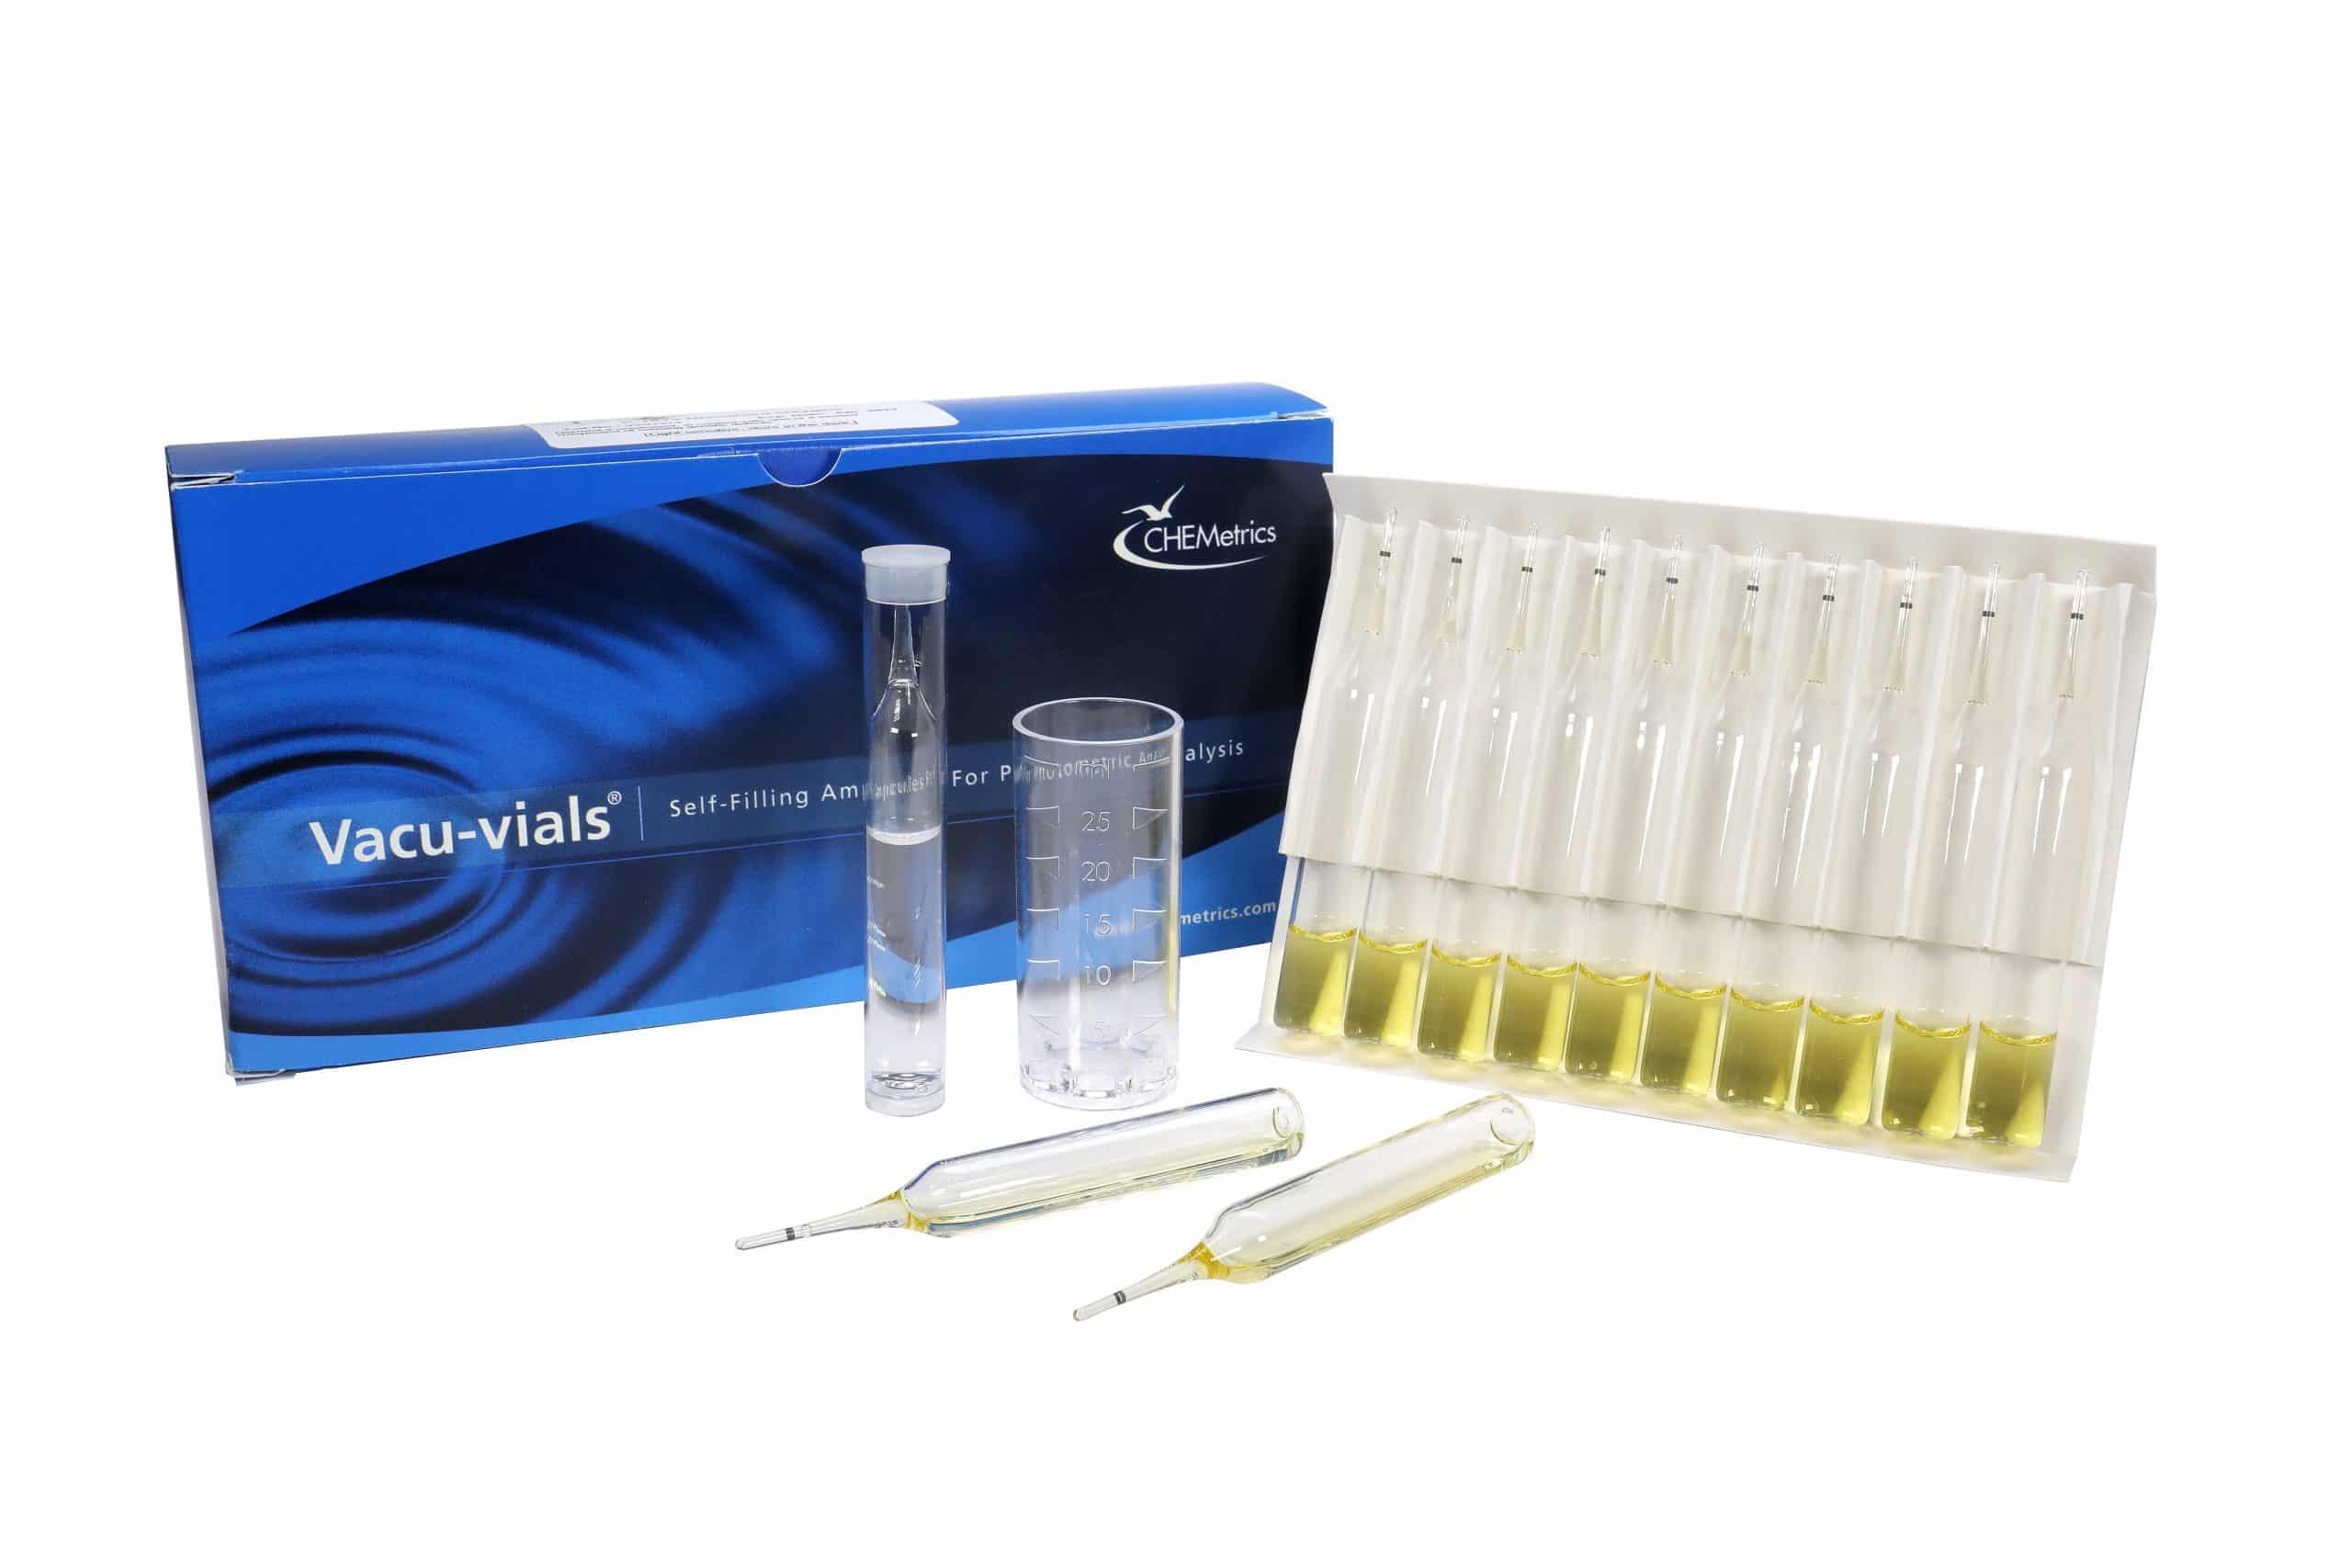 K-7513_r1-scaled CHEMetrics Water Test Kits